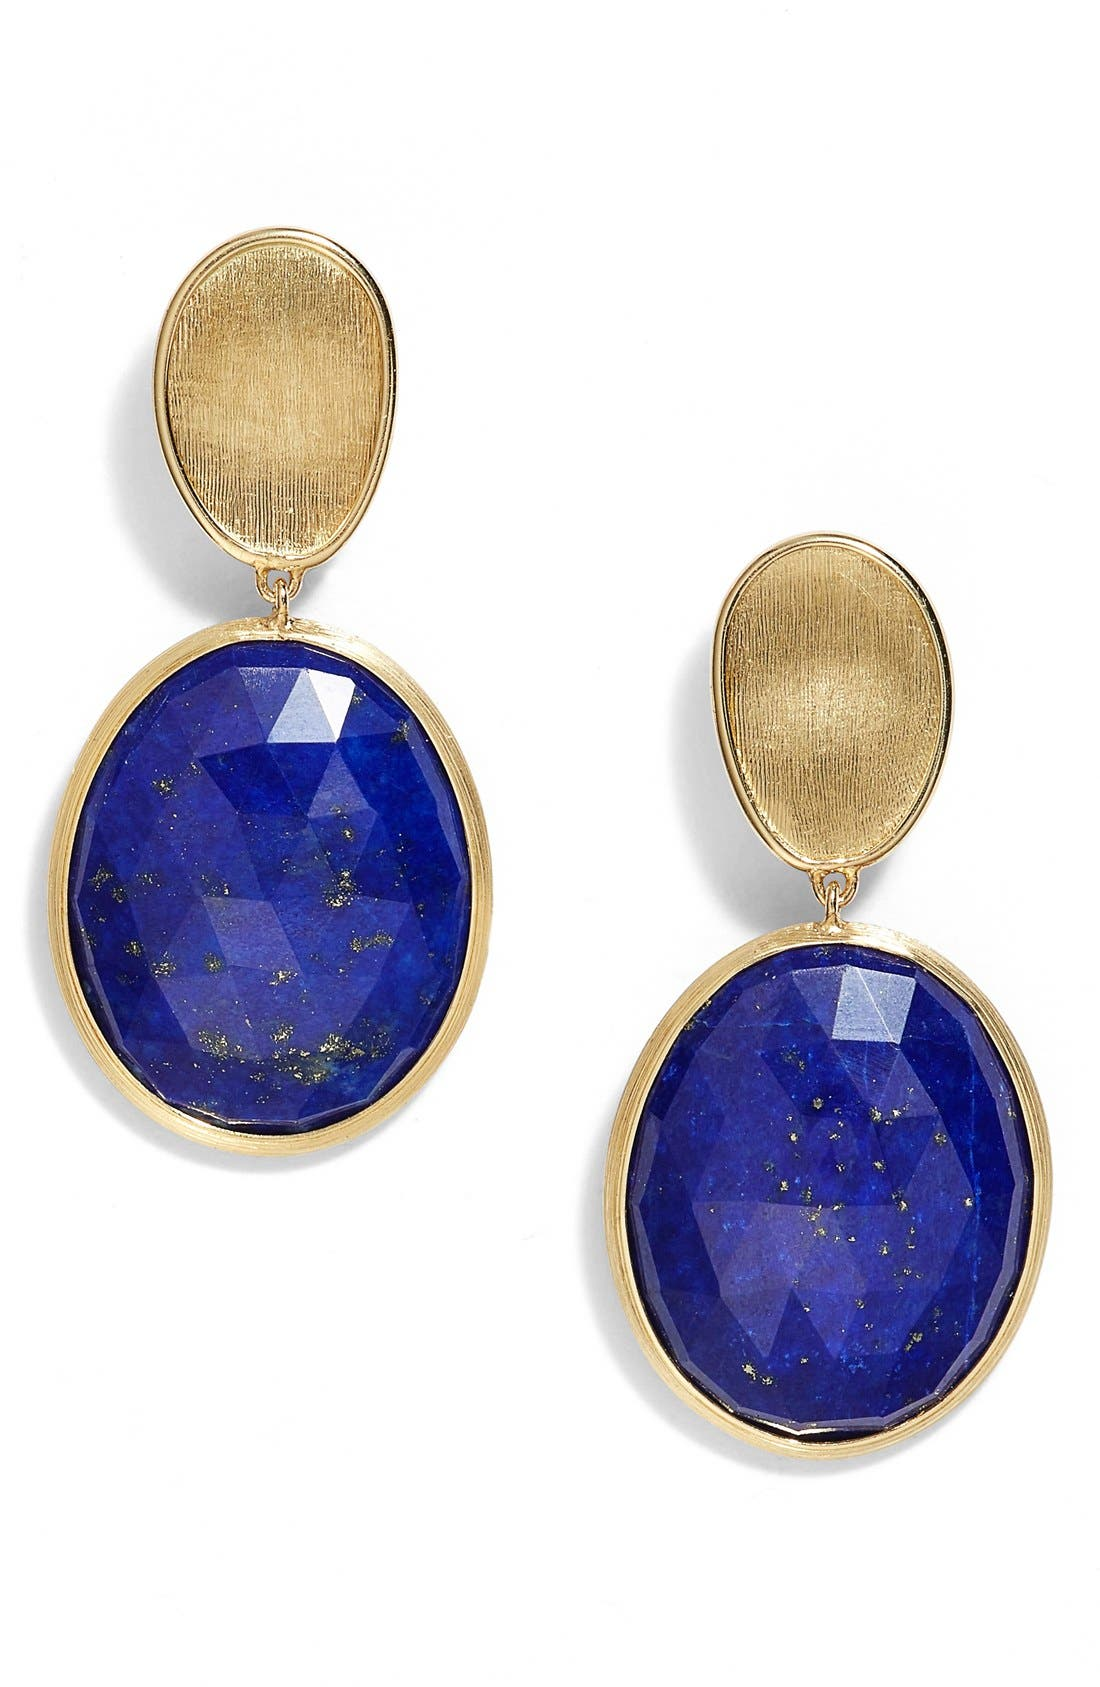 Lunaria Semiprecious Stone Drop Earrings,                             Main thumbnail 1, color,                             Yellow Gold/ Lapis